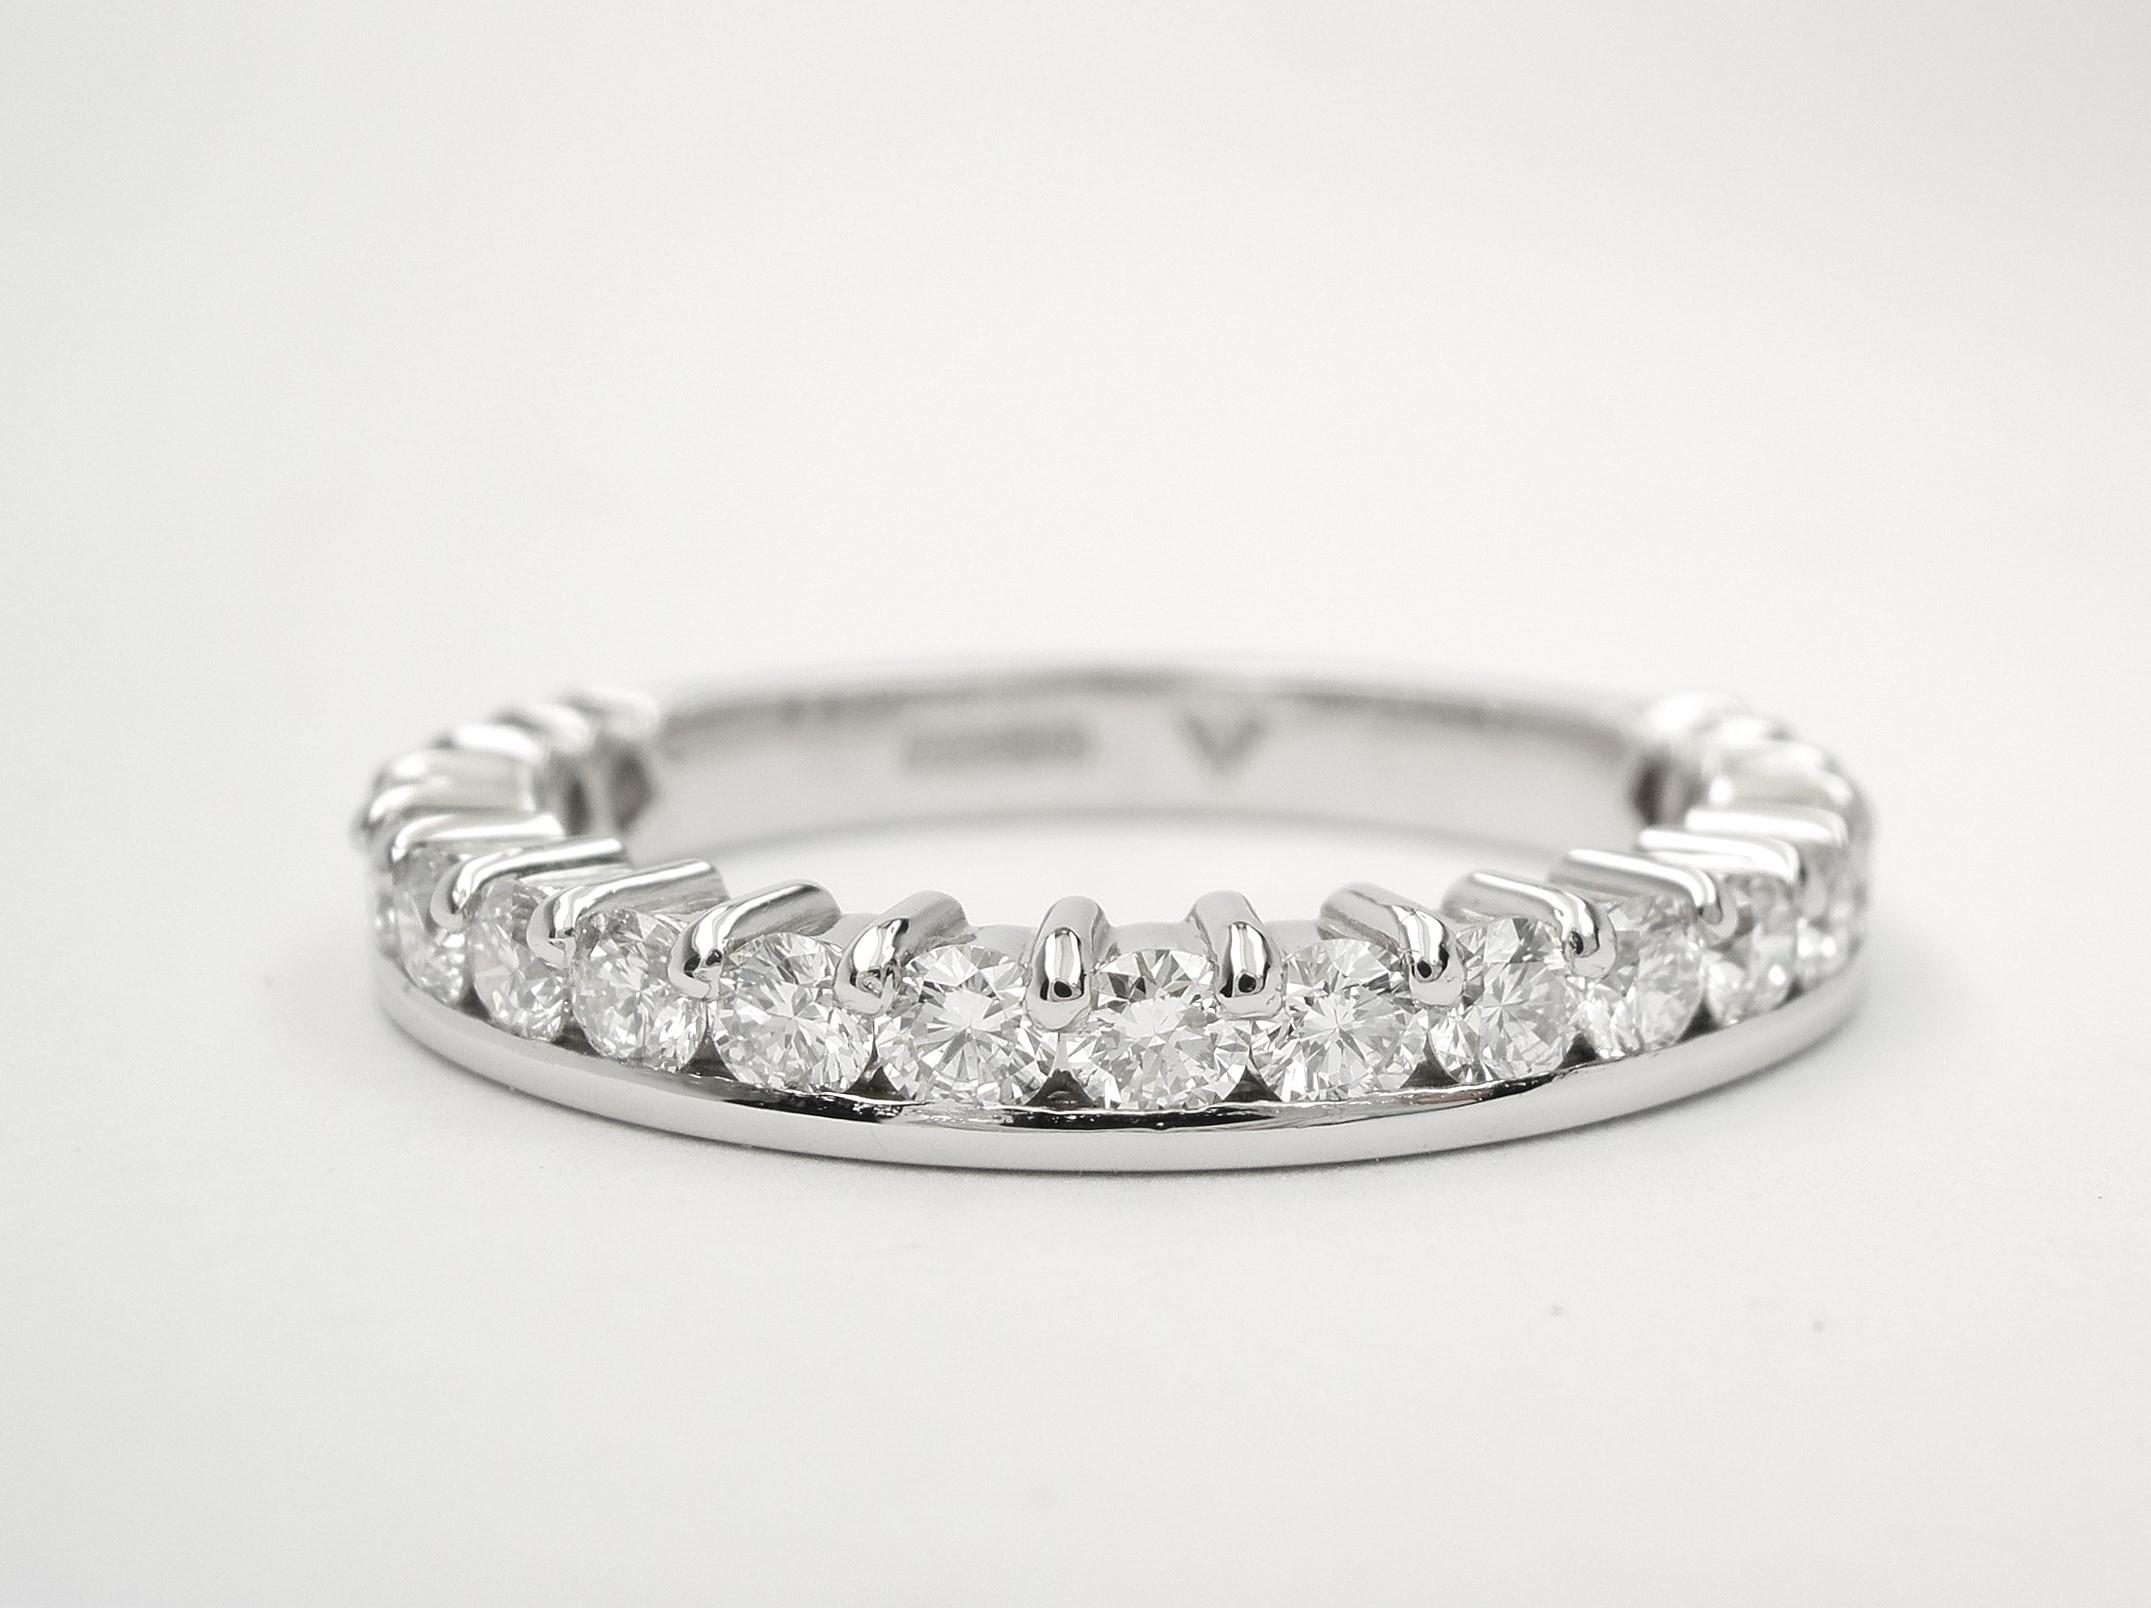 Platinum part channel set round brilliant cut diamond wedding ring set to 65%.